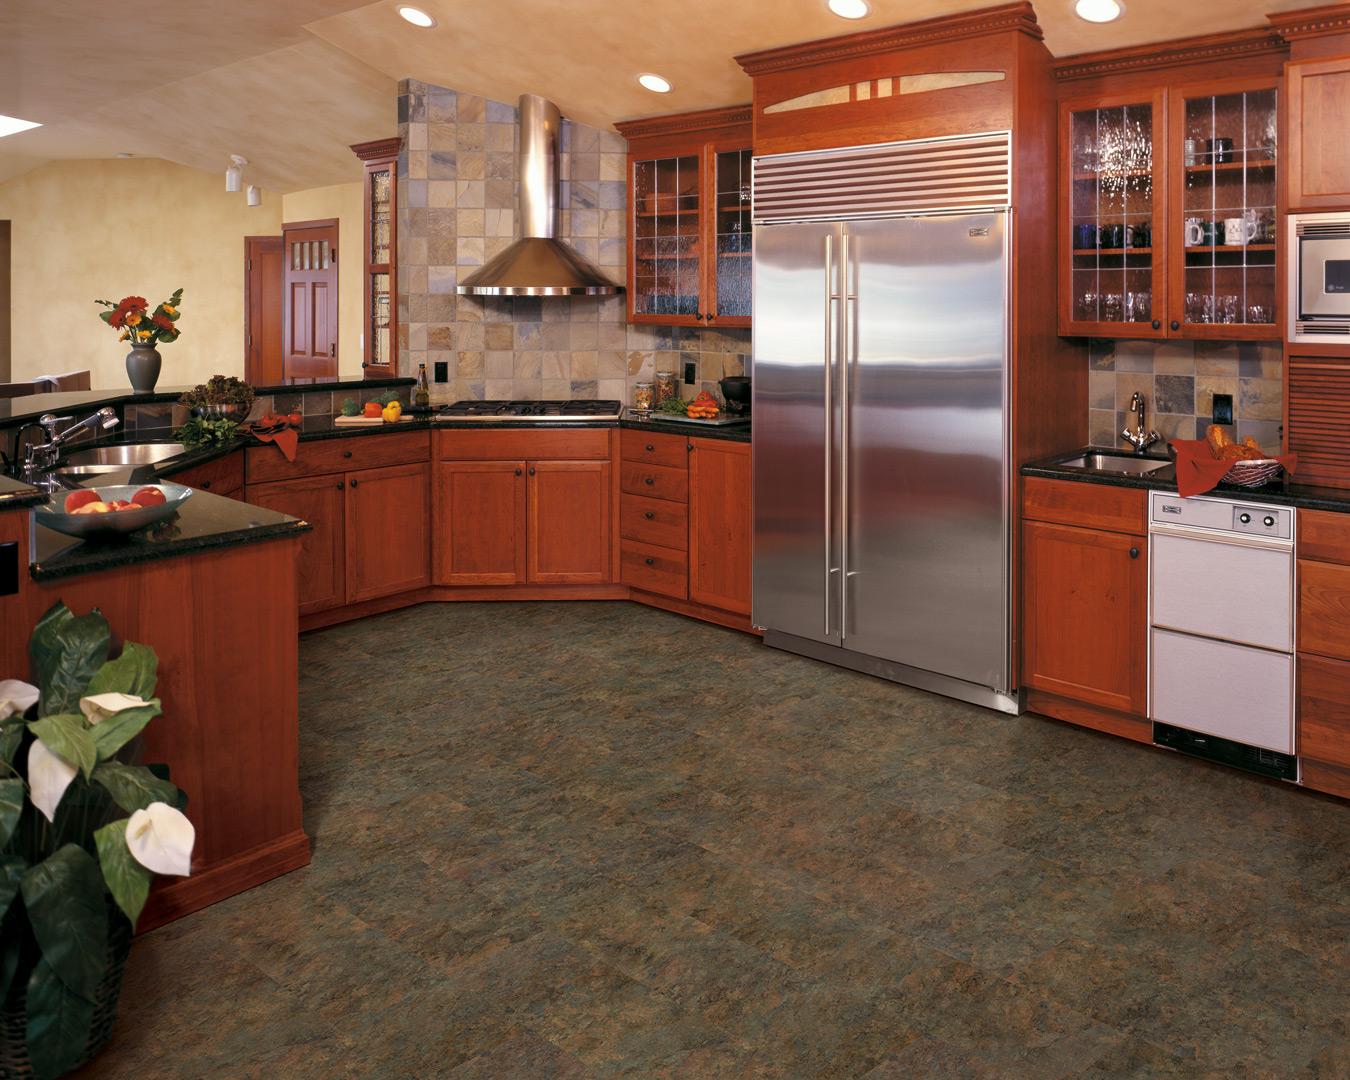 How To Install Vinyl Plank Flooring Around Kitchen Cabinets